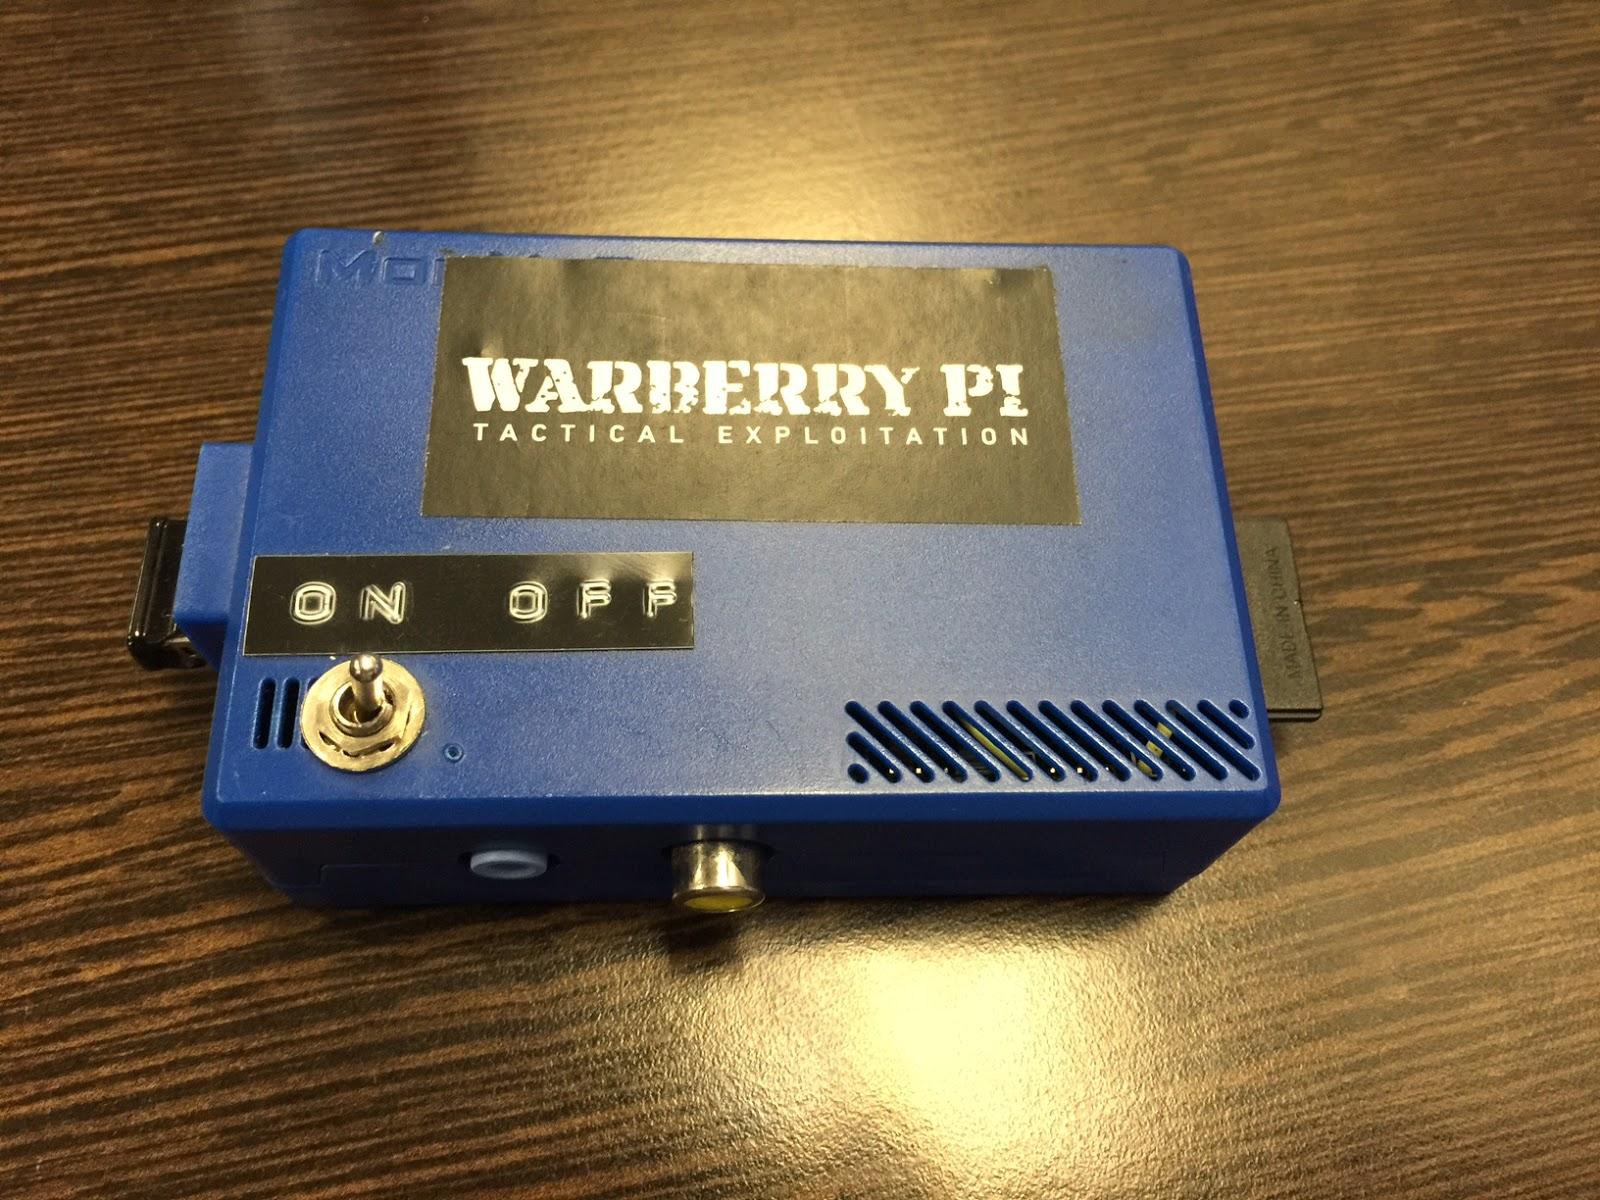 WarBerryPi - Turn your Raspberry Pi into a War Machine